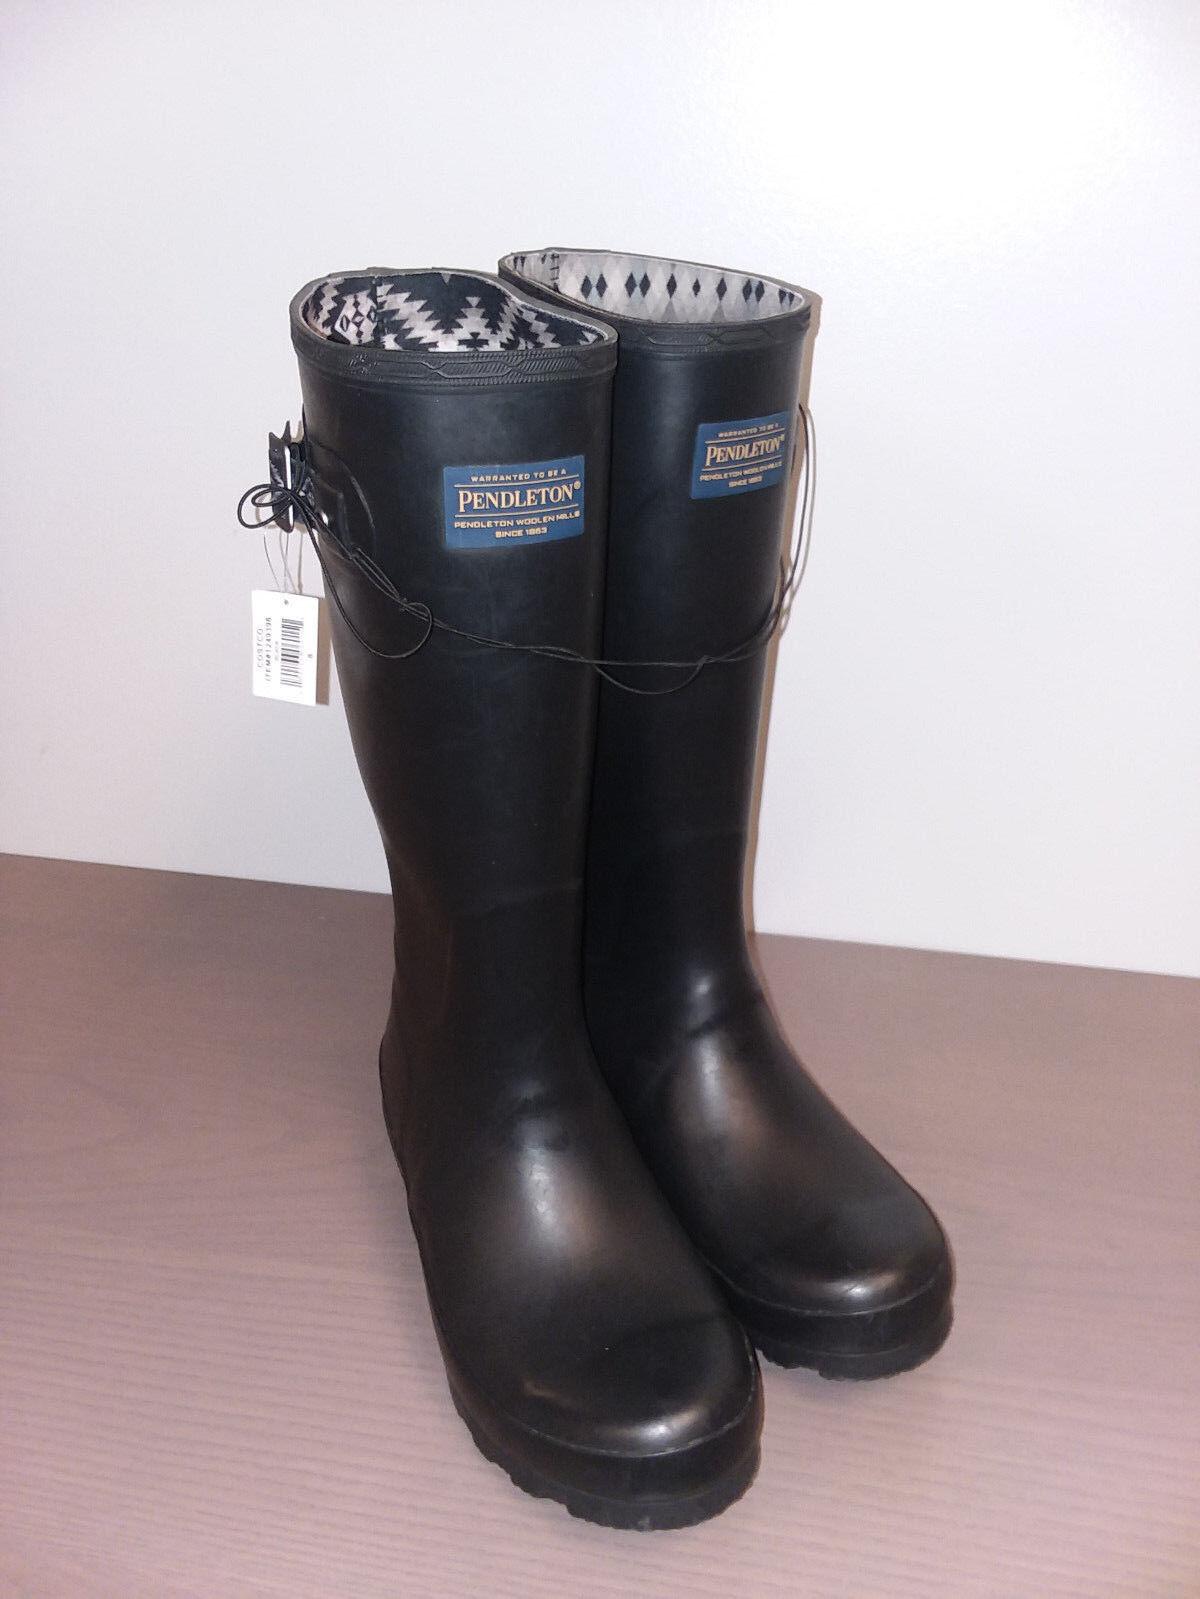 NIB Pendleton Women's Classic Rubber Boot, Black, Sz 6